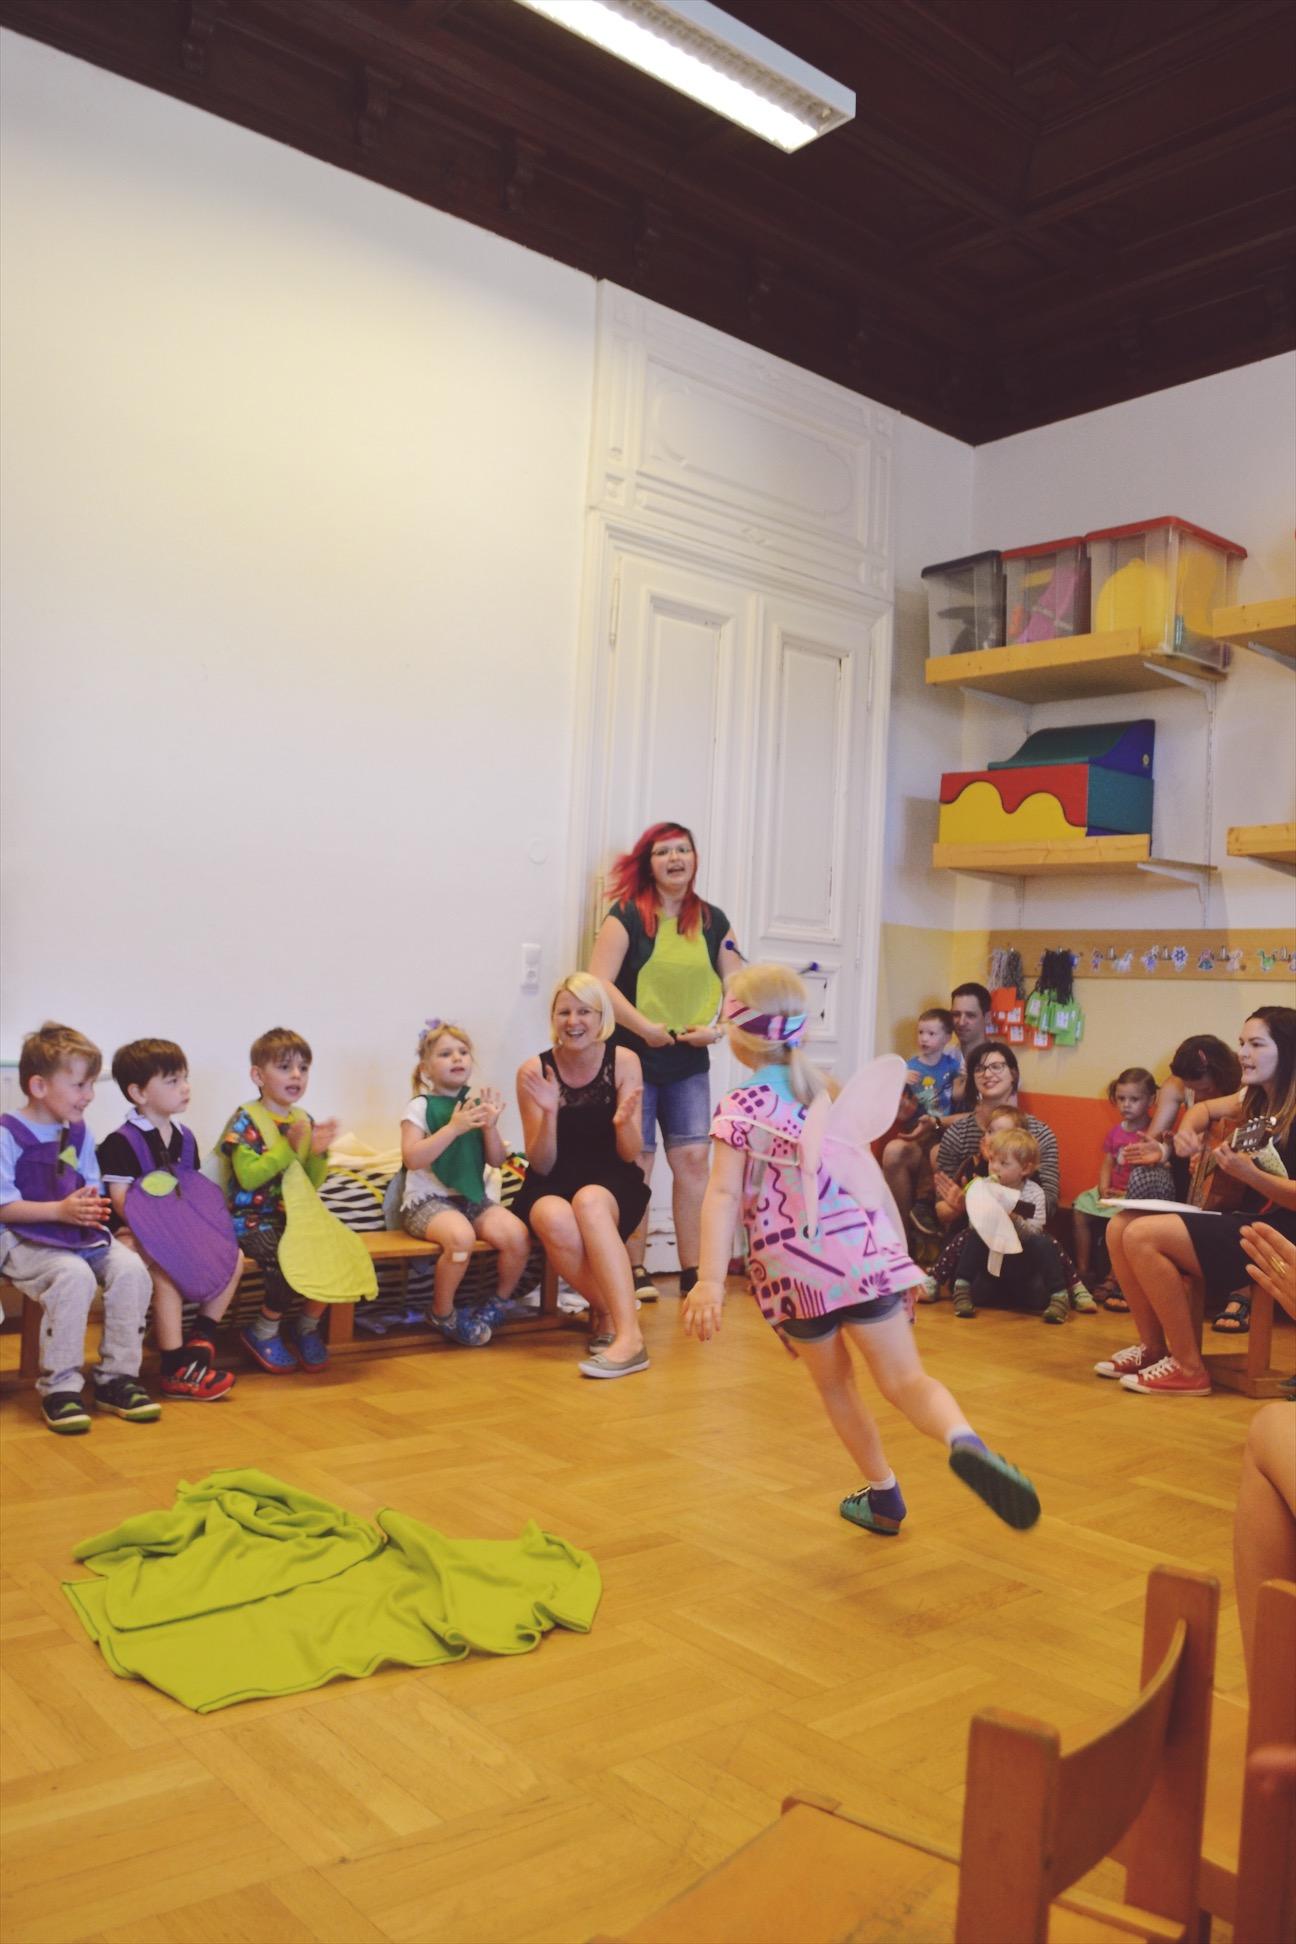 zaubervilla-familienfest-2017-03.JPG